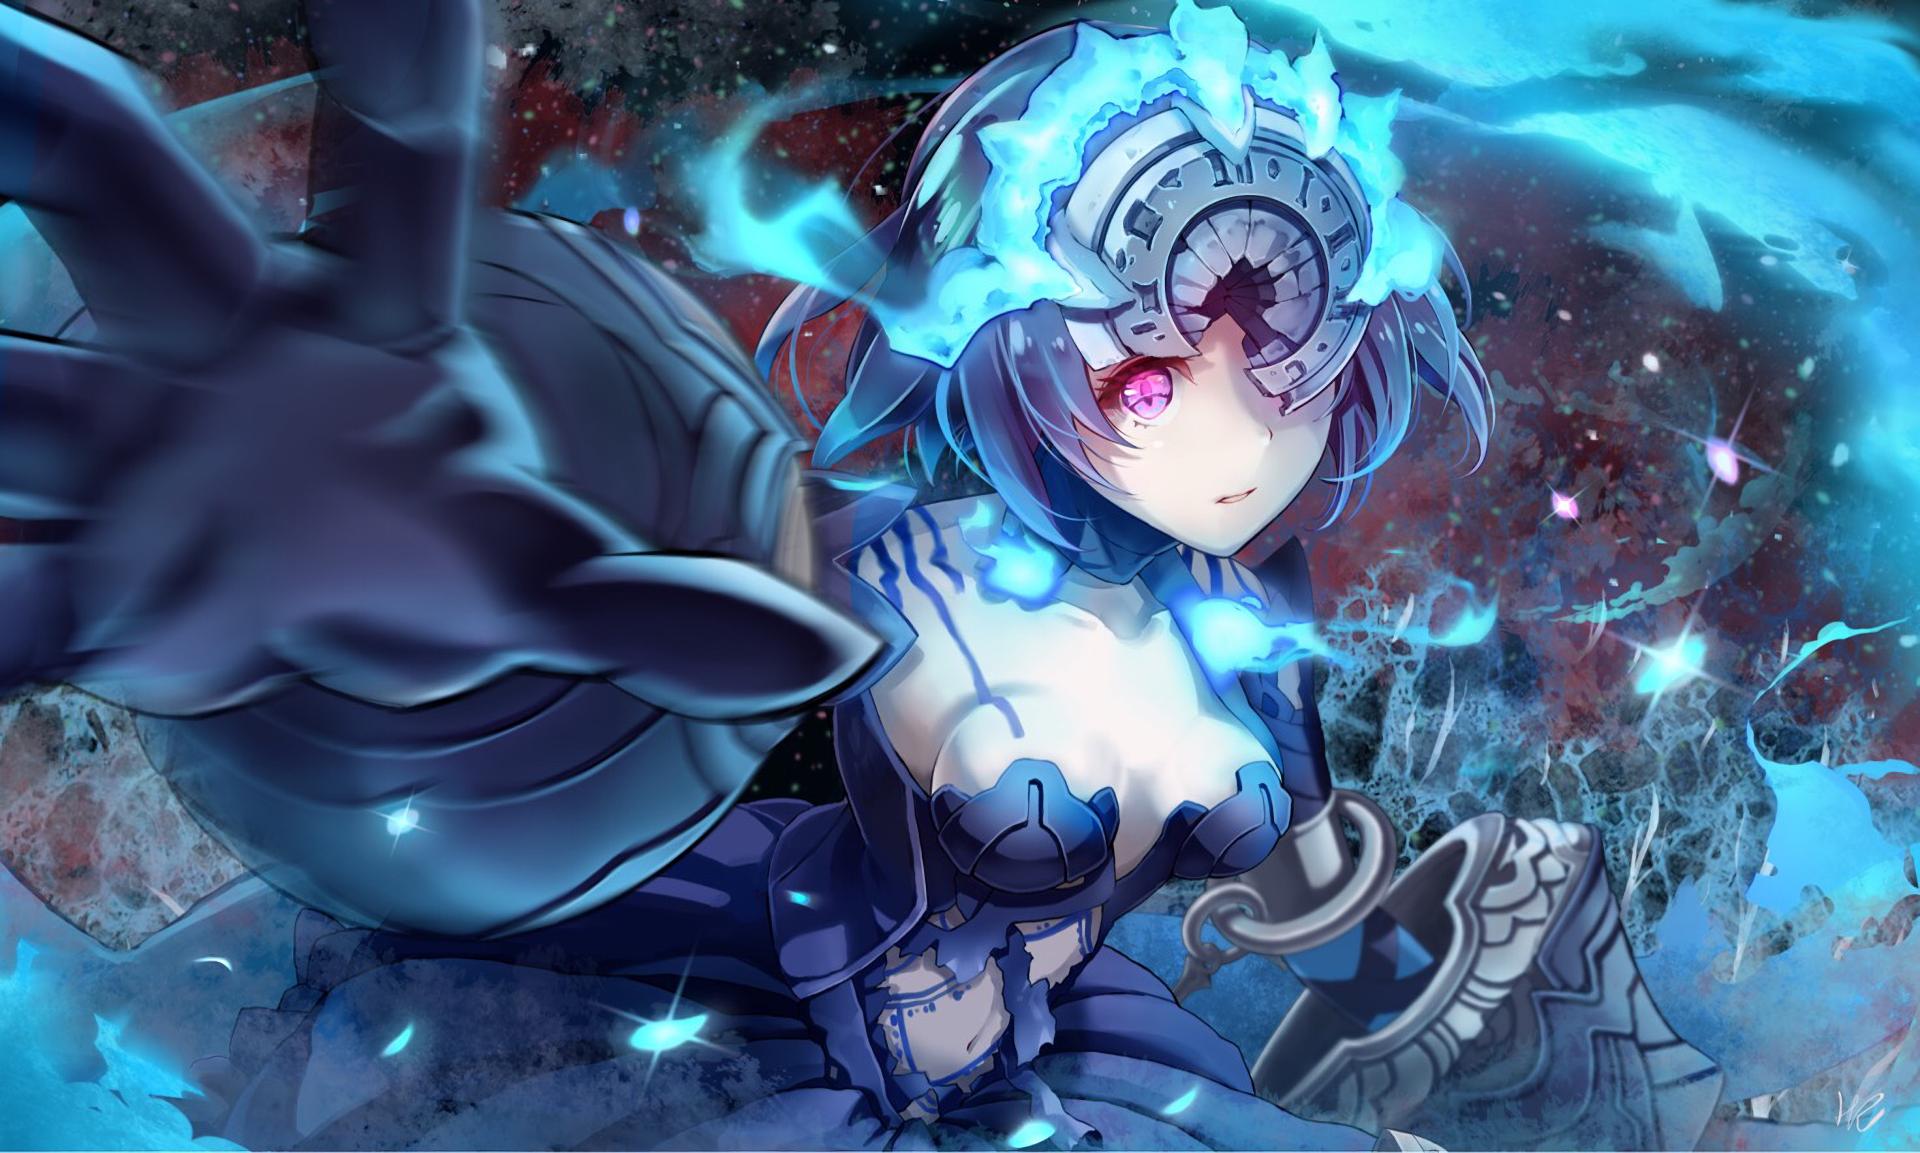 Image Result For Anime Wallpaper Iphone Pinterest